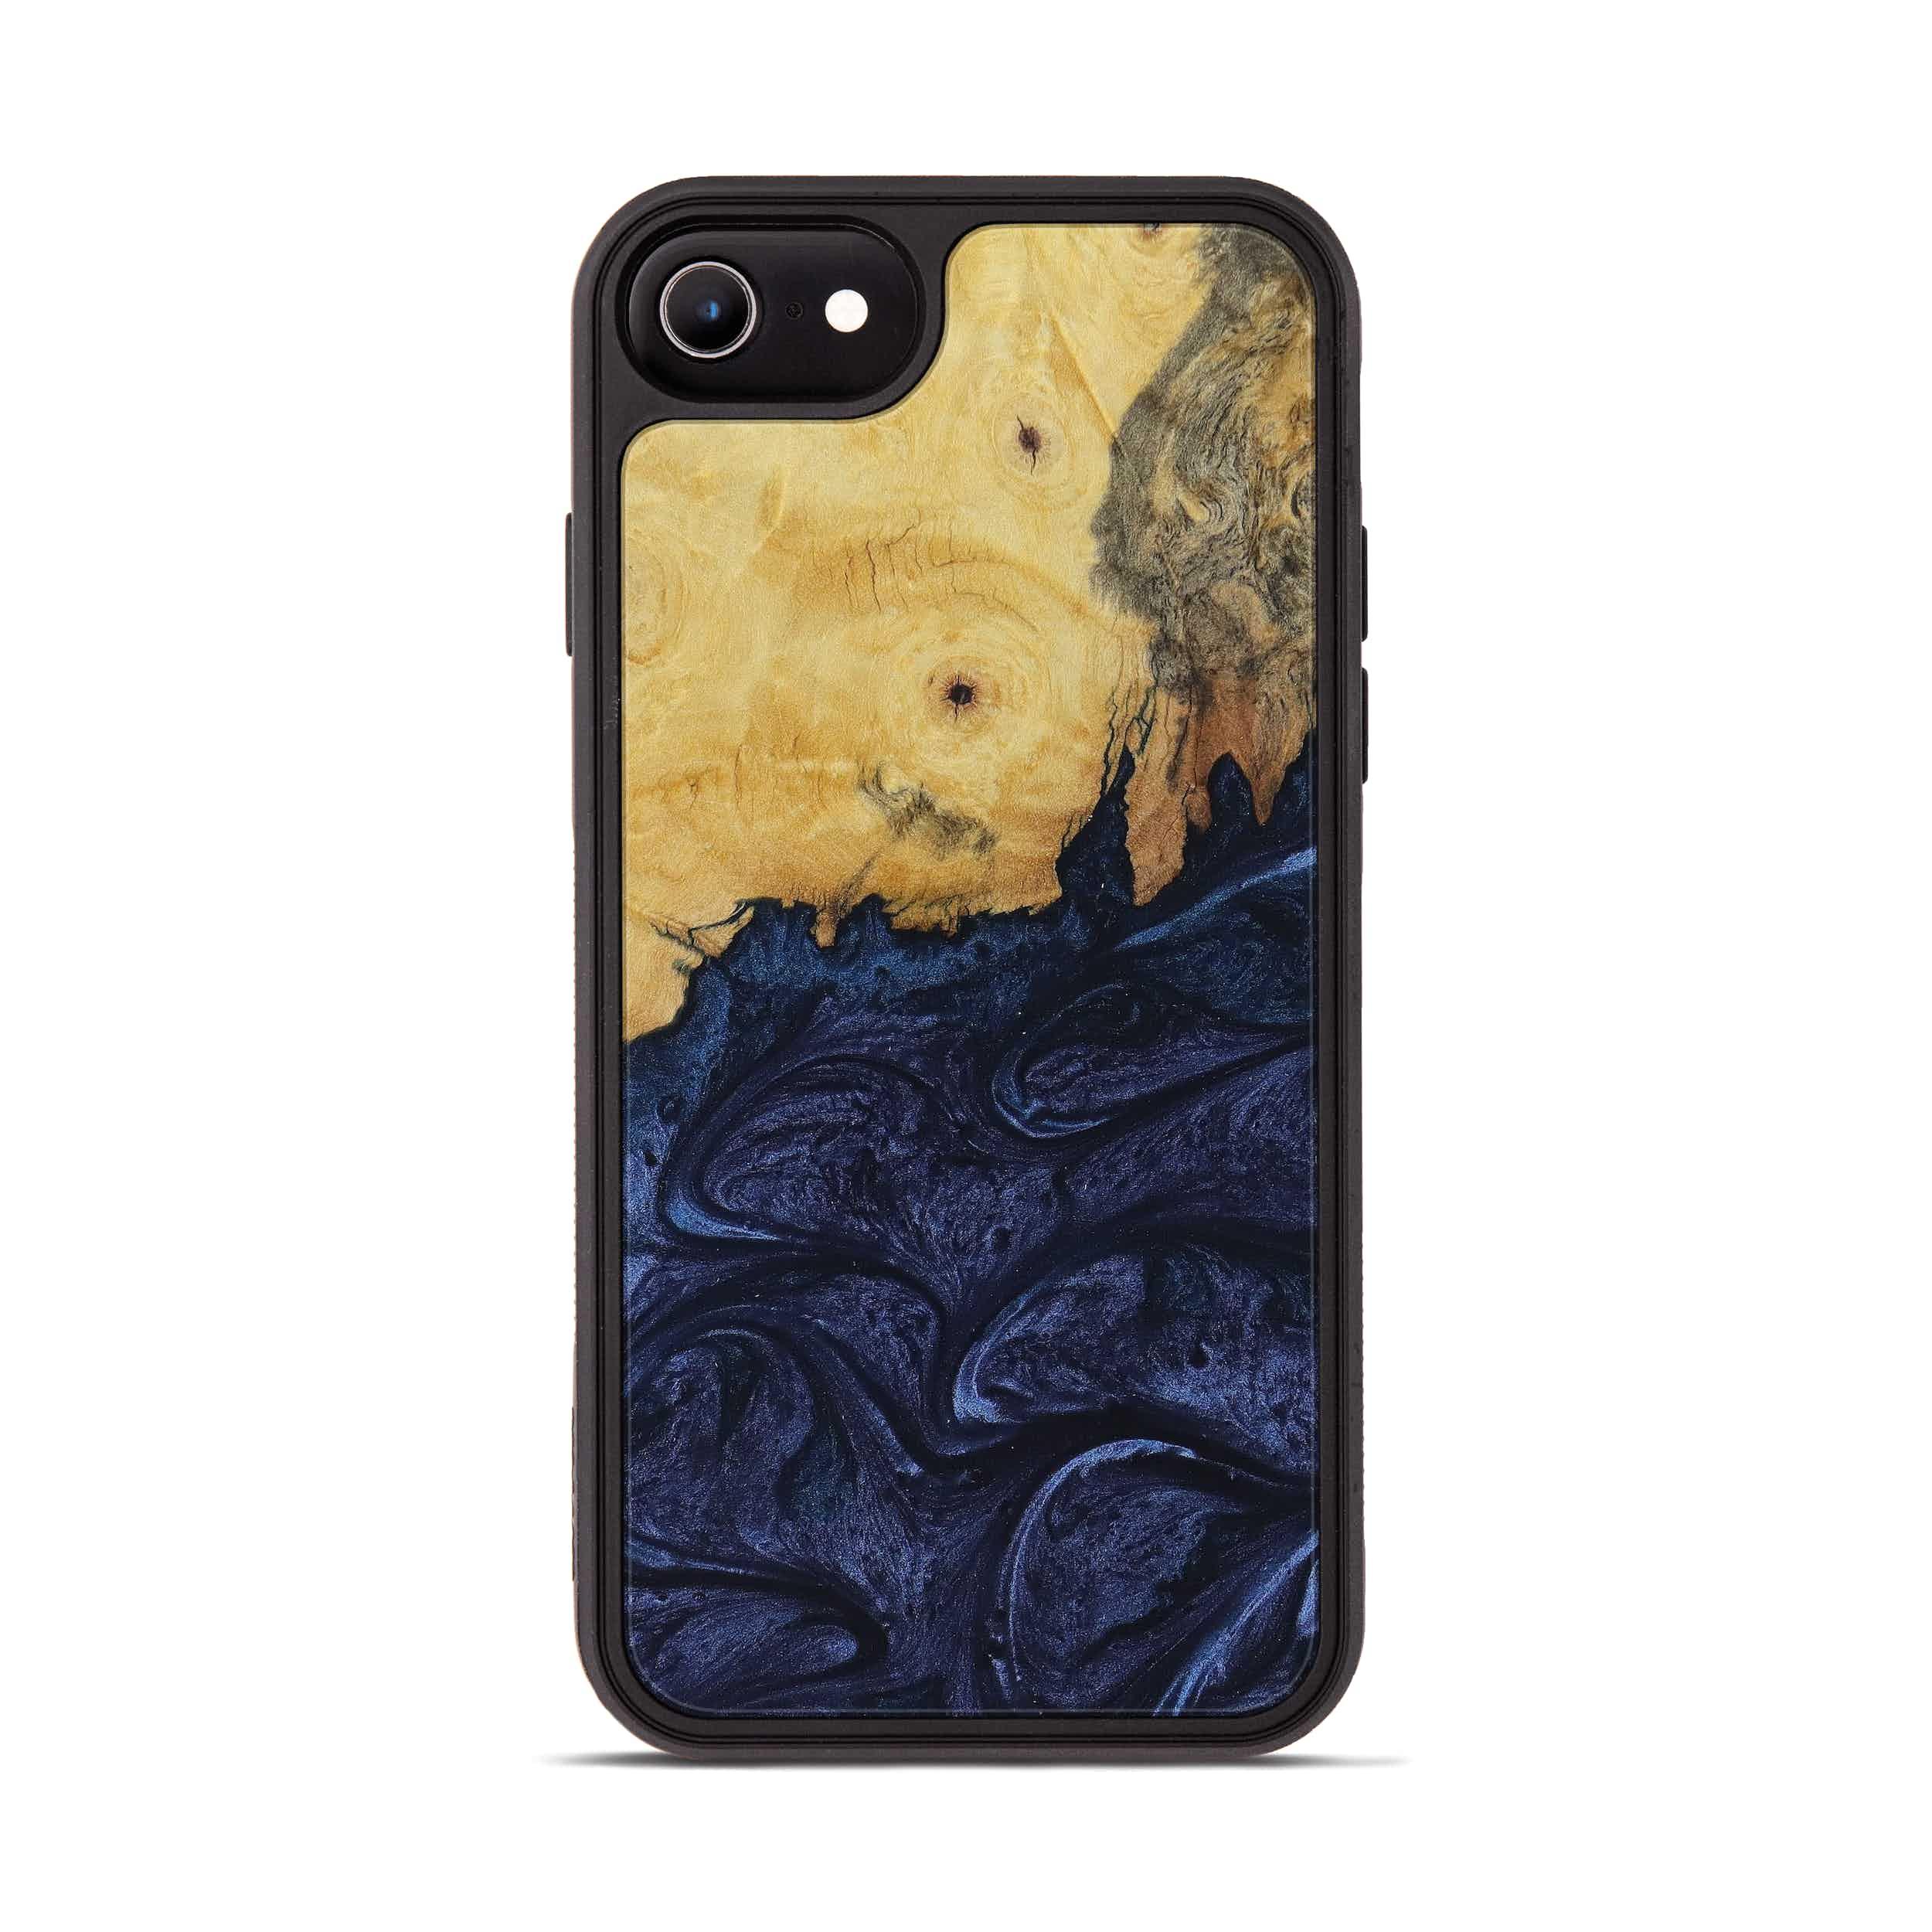 iPhone 6s Wood+Resin Phone Case - Darnell (Dark Blue, 397396)